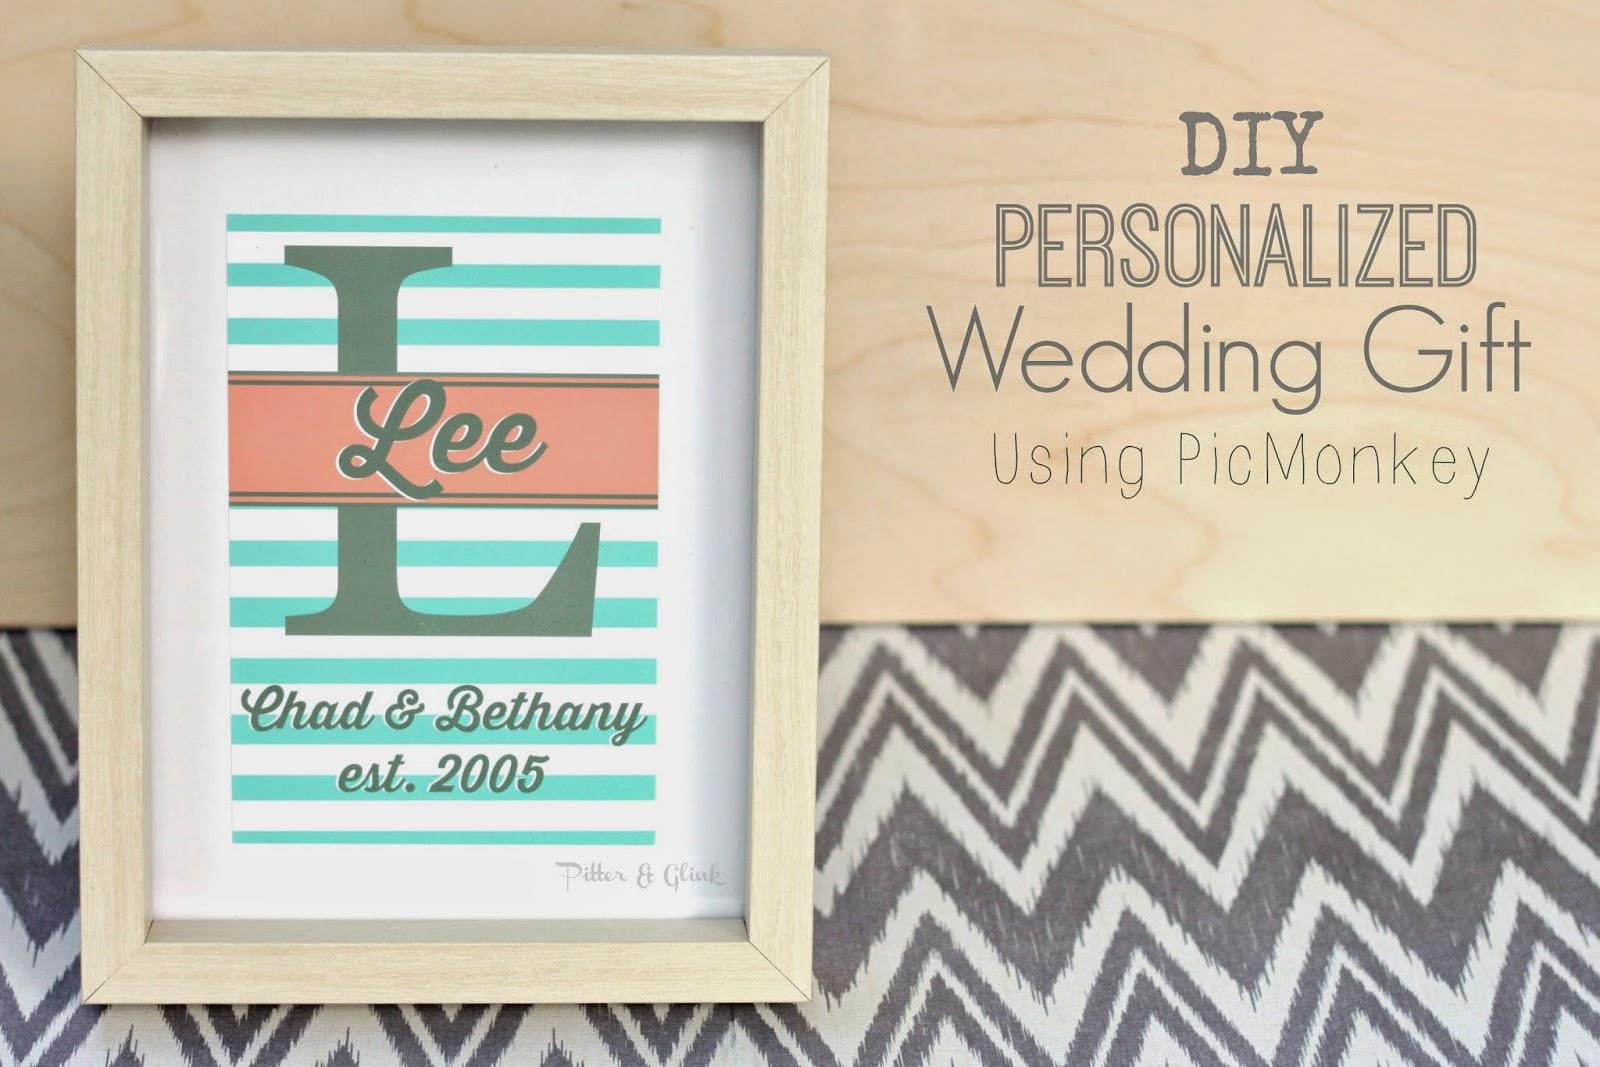 diy personalized wedding gift using custom wedding gifts Create an inexpensive personalized wedding gift using PicMonkey and digital scrapbook paper pitterandglink